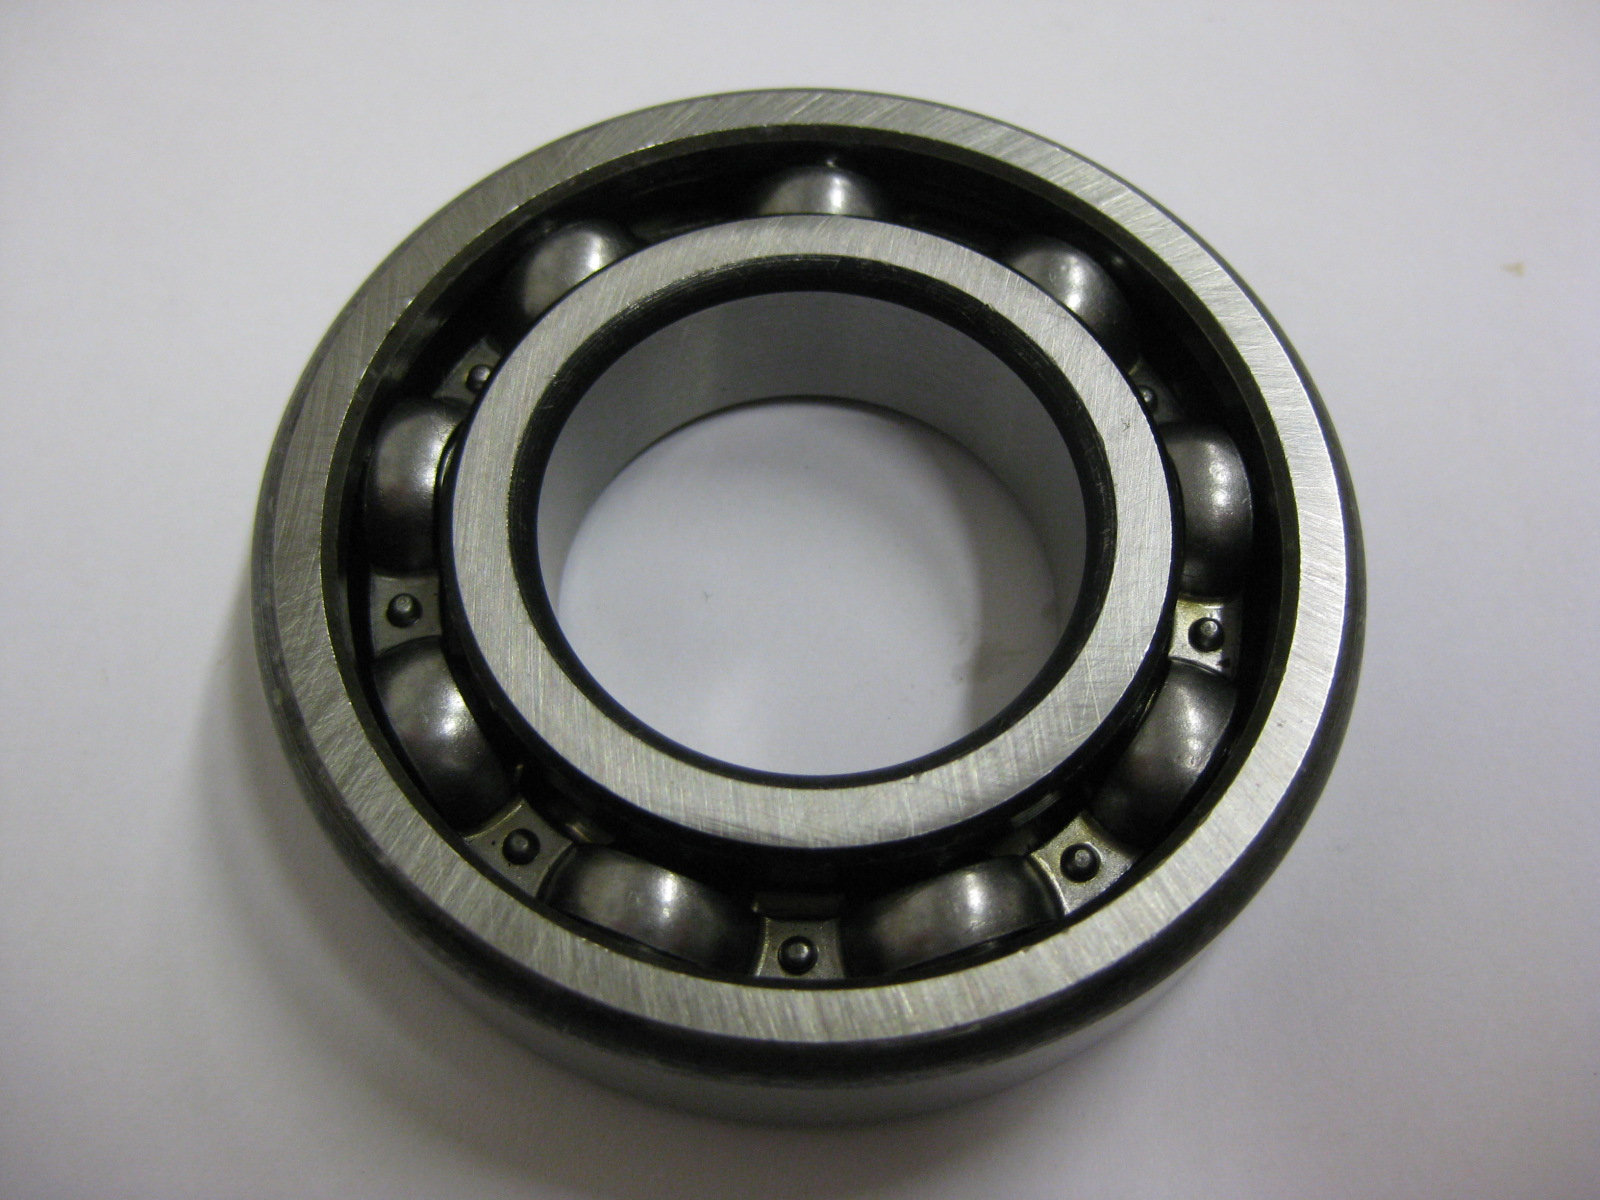 ložisko kuličkové 6207 V2-5, Multicar M25